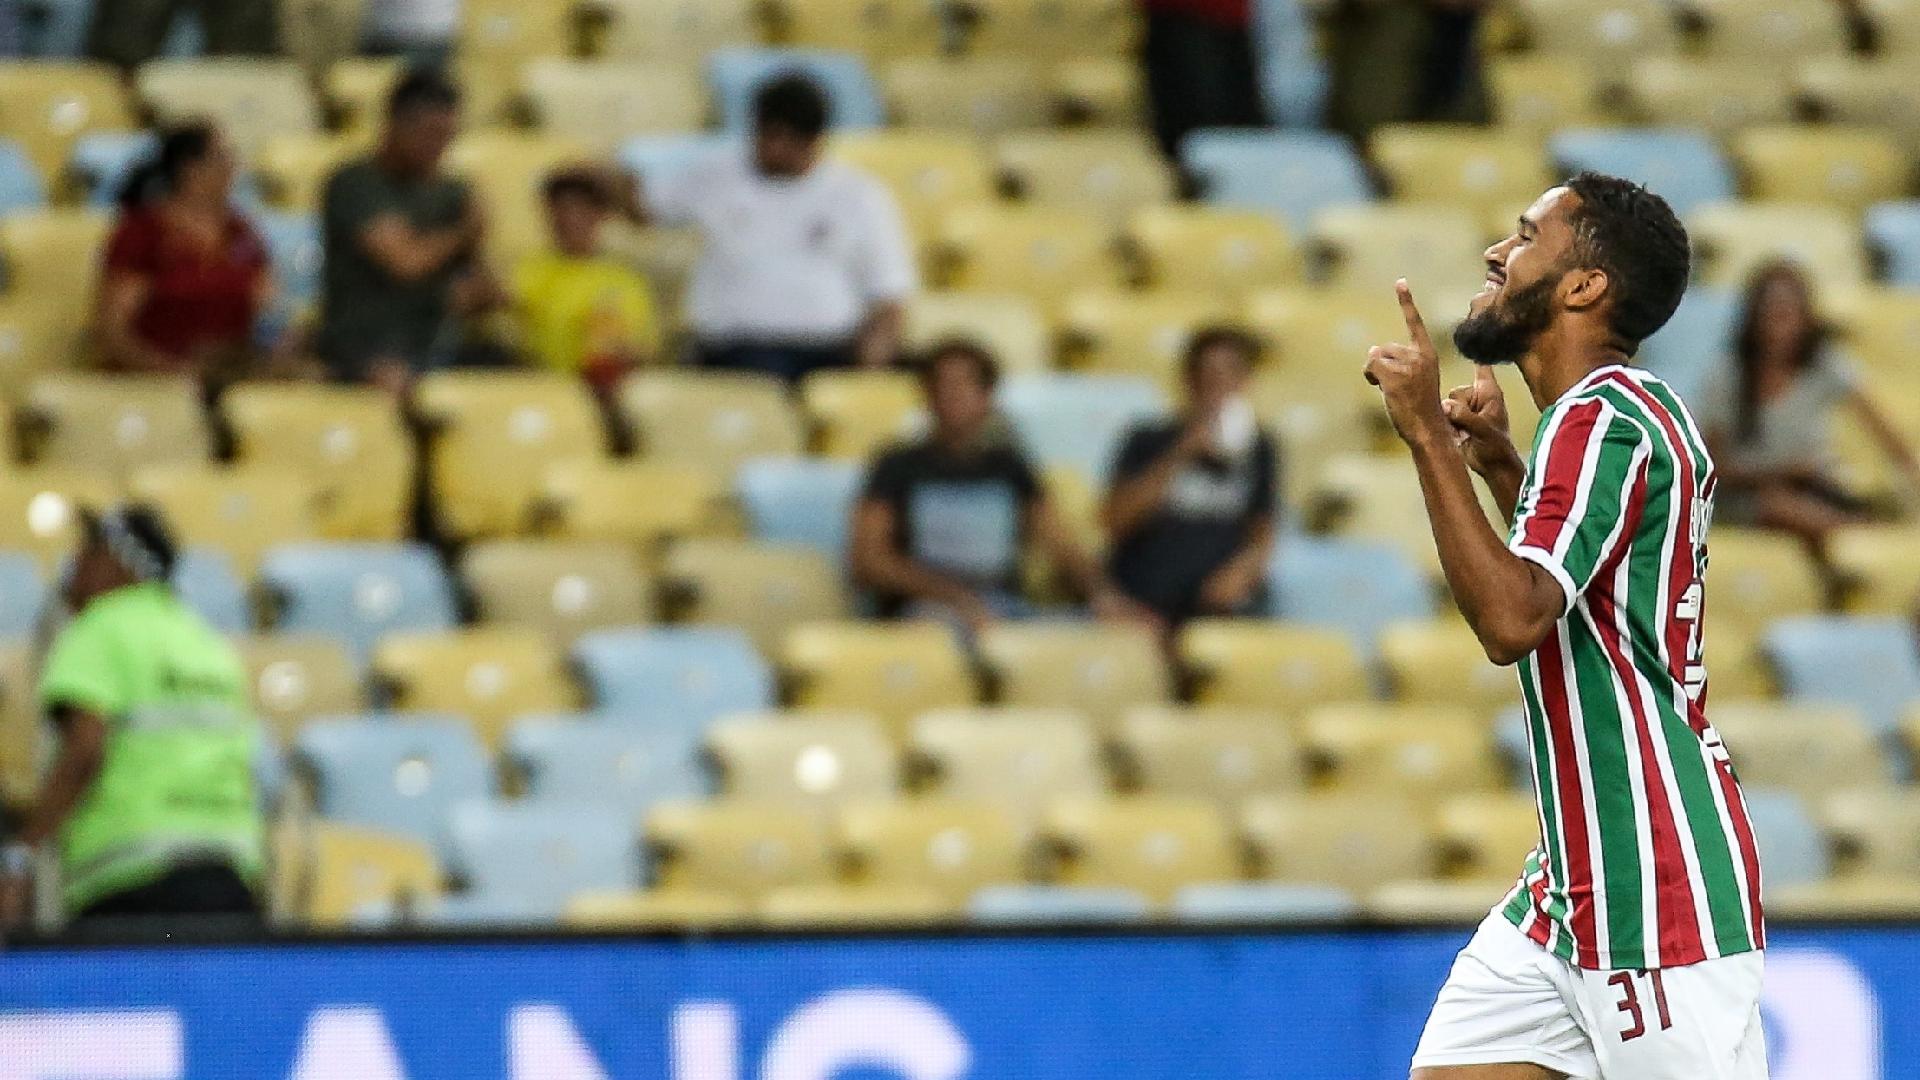 Everaldo comemora gol do Fluminense pela Copa do Brasil